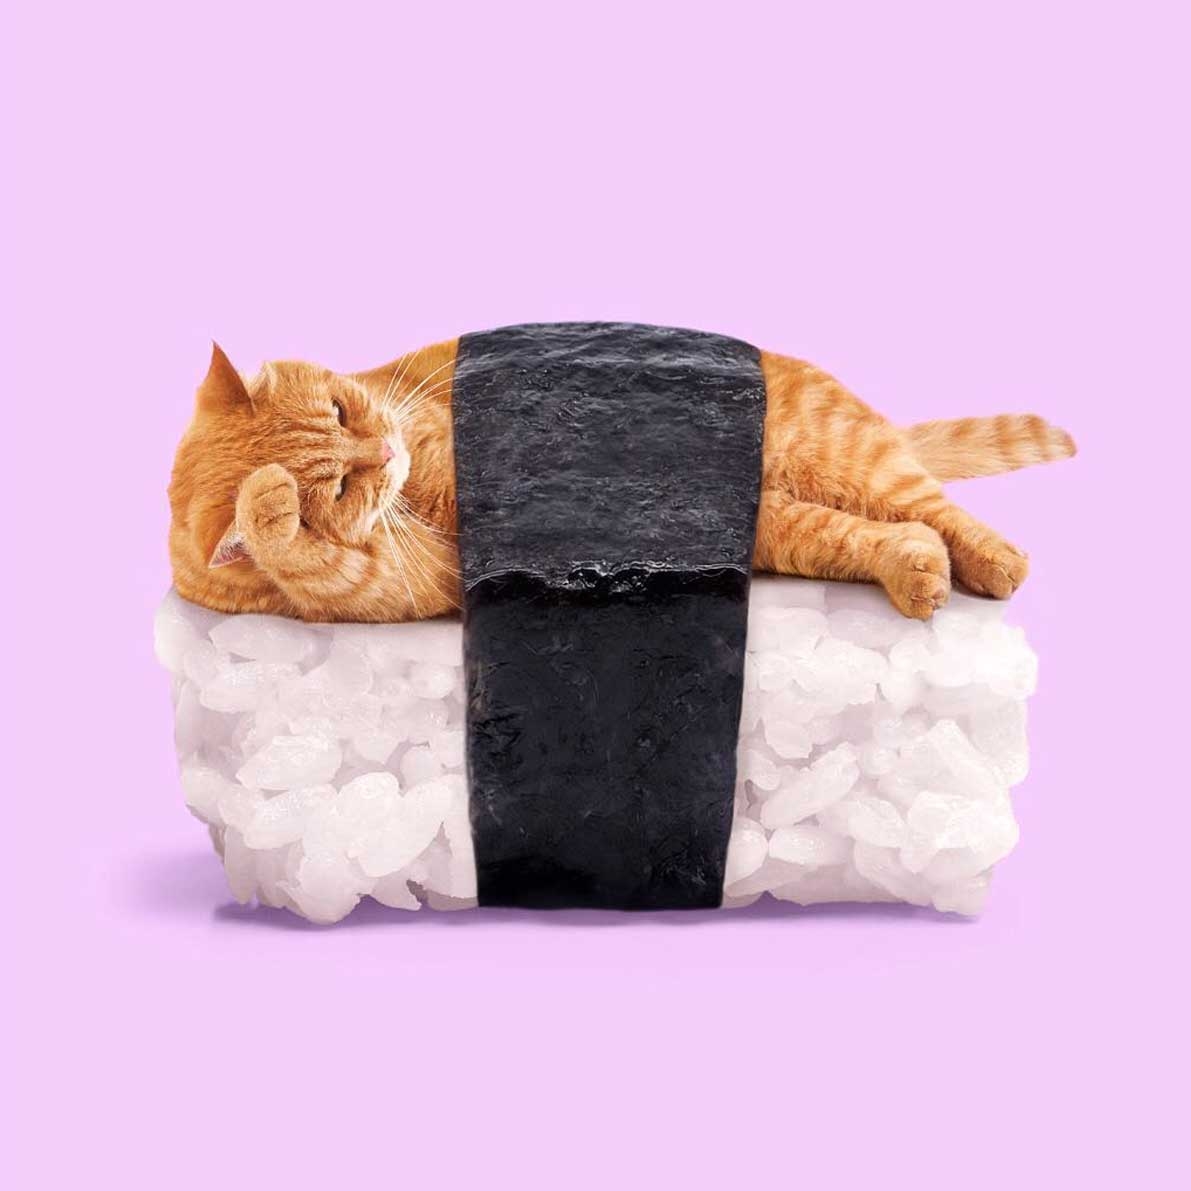 Katzen-Sushi, Pizza-Bikini und Schokolinsen-Schreibmaschine Paul-Fuentes-2019_12